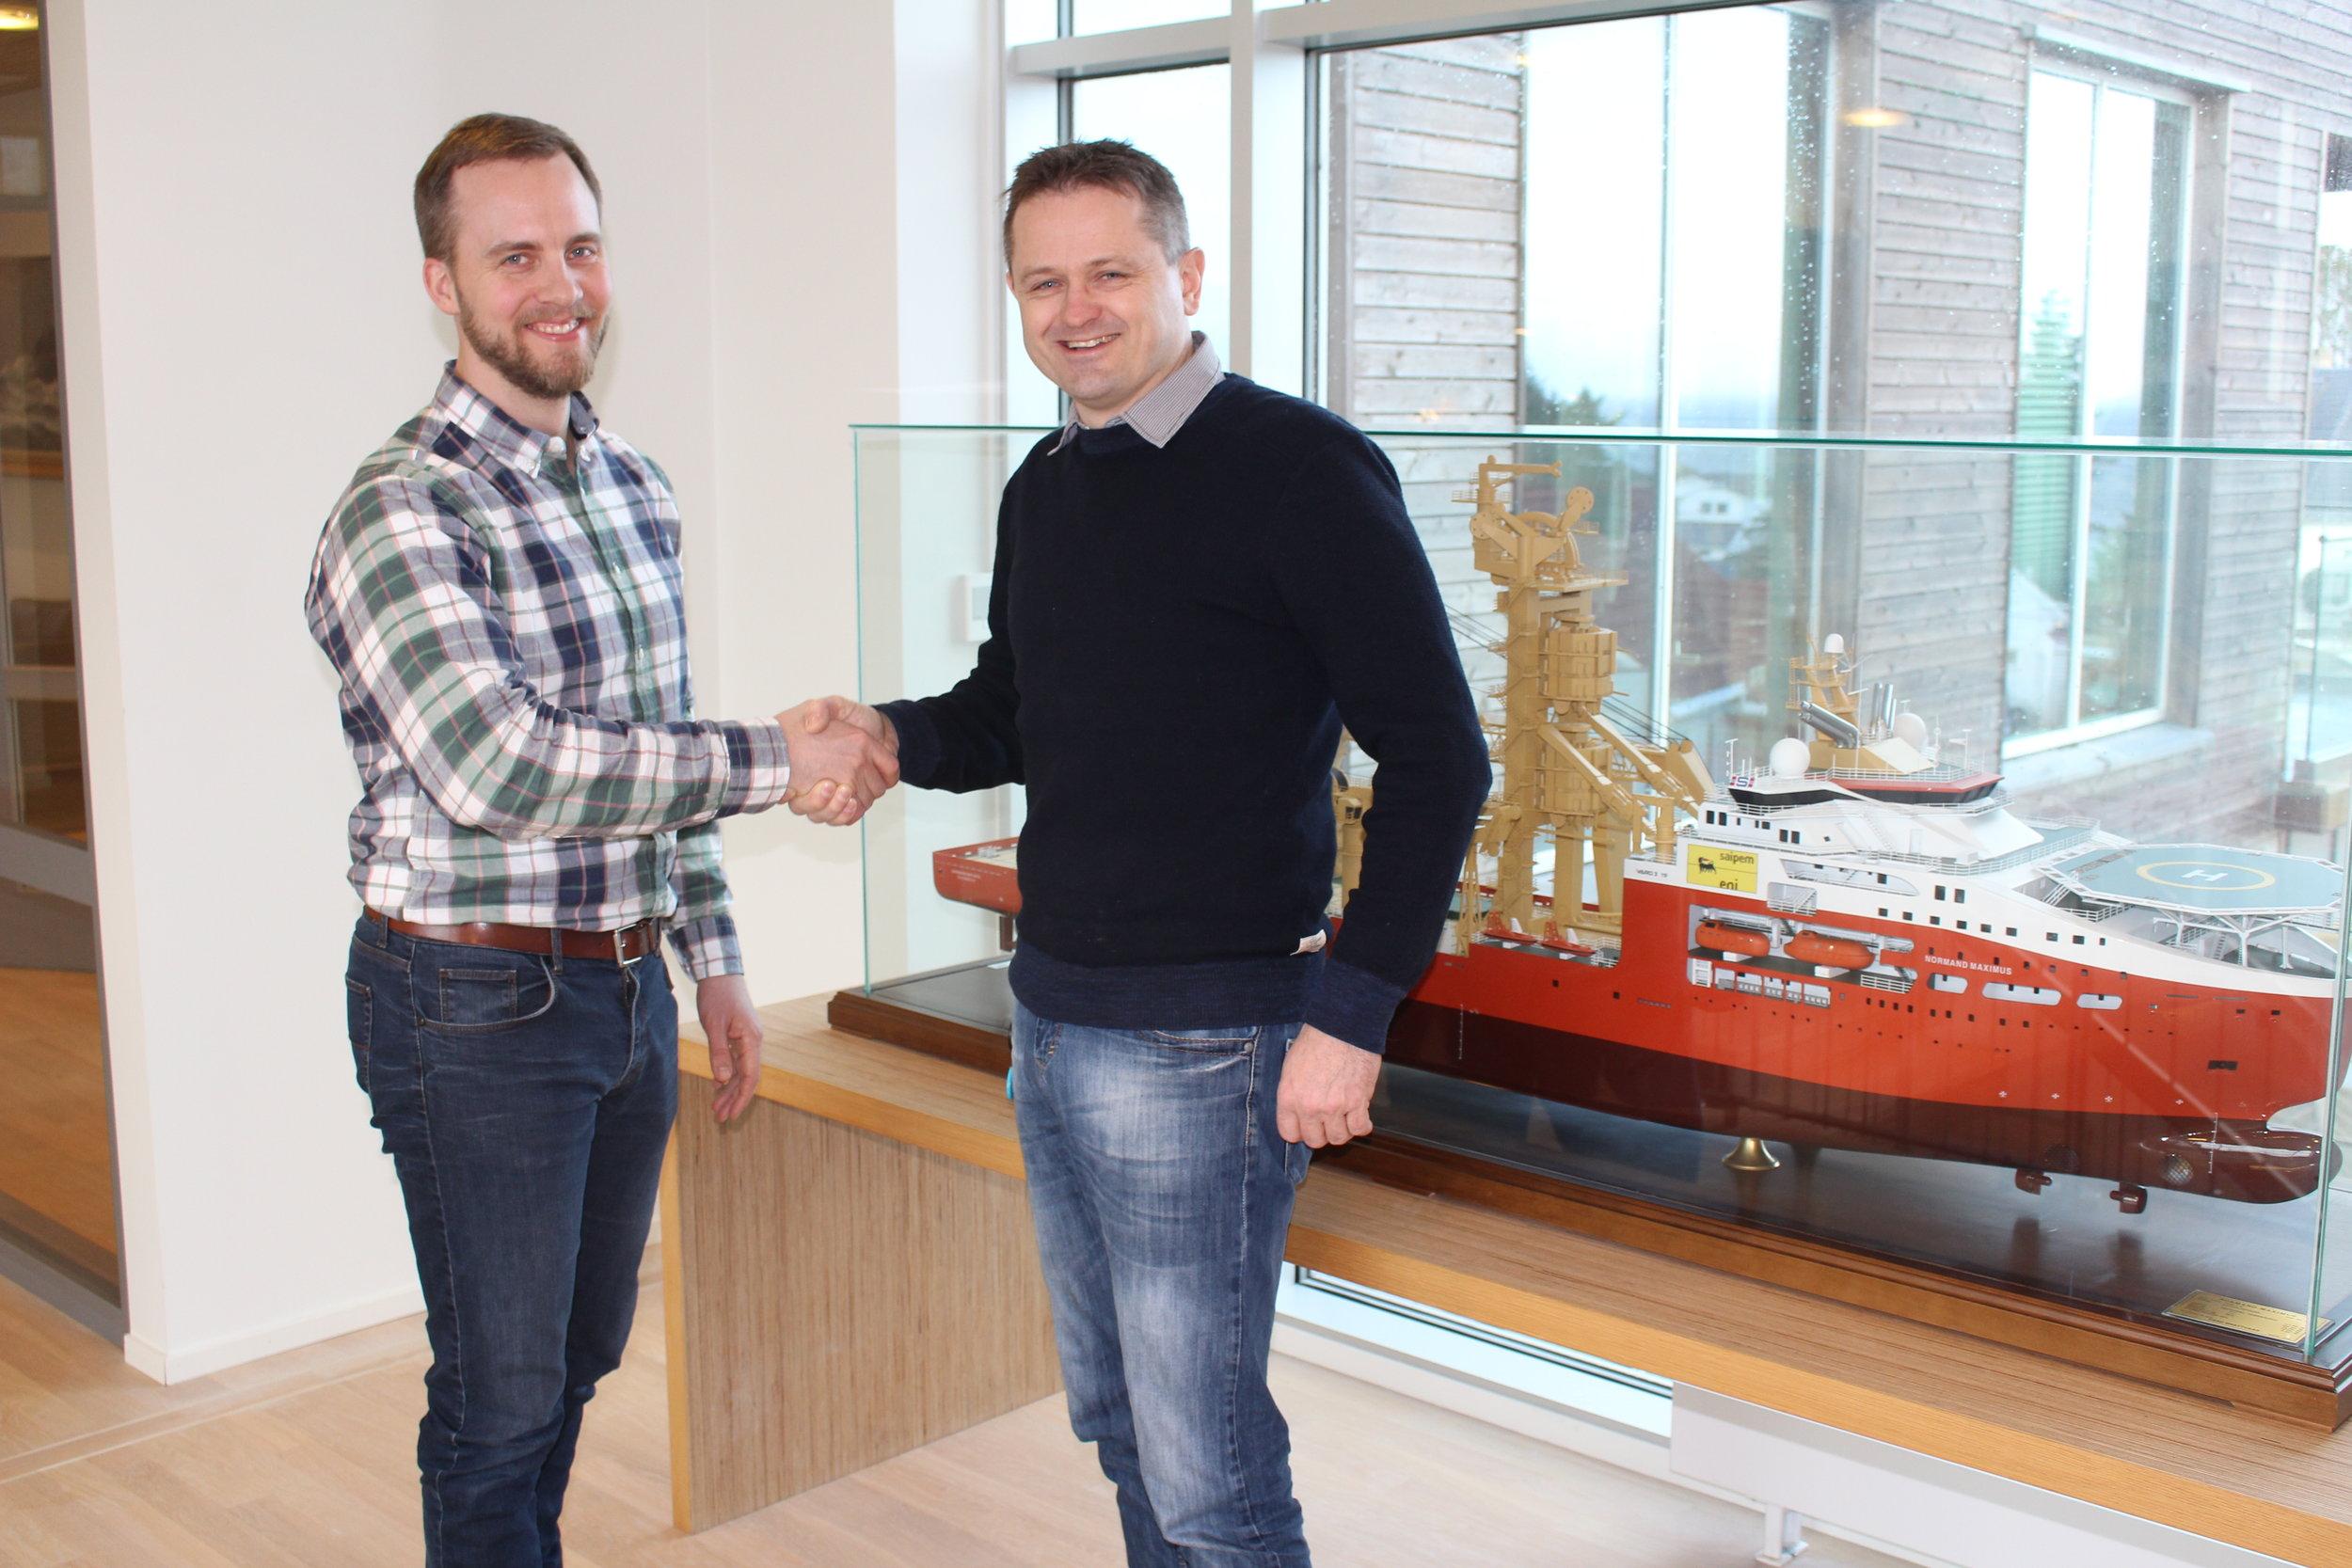 Gjord Simen Sanna, CEO, Yxney Maritime AS (left) and Svein Erik Isaksen, Environmental Engineer (right)